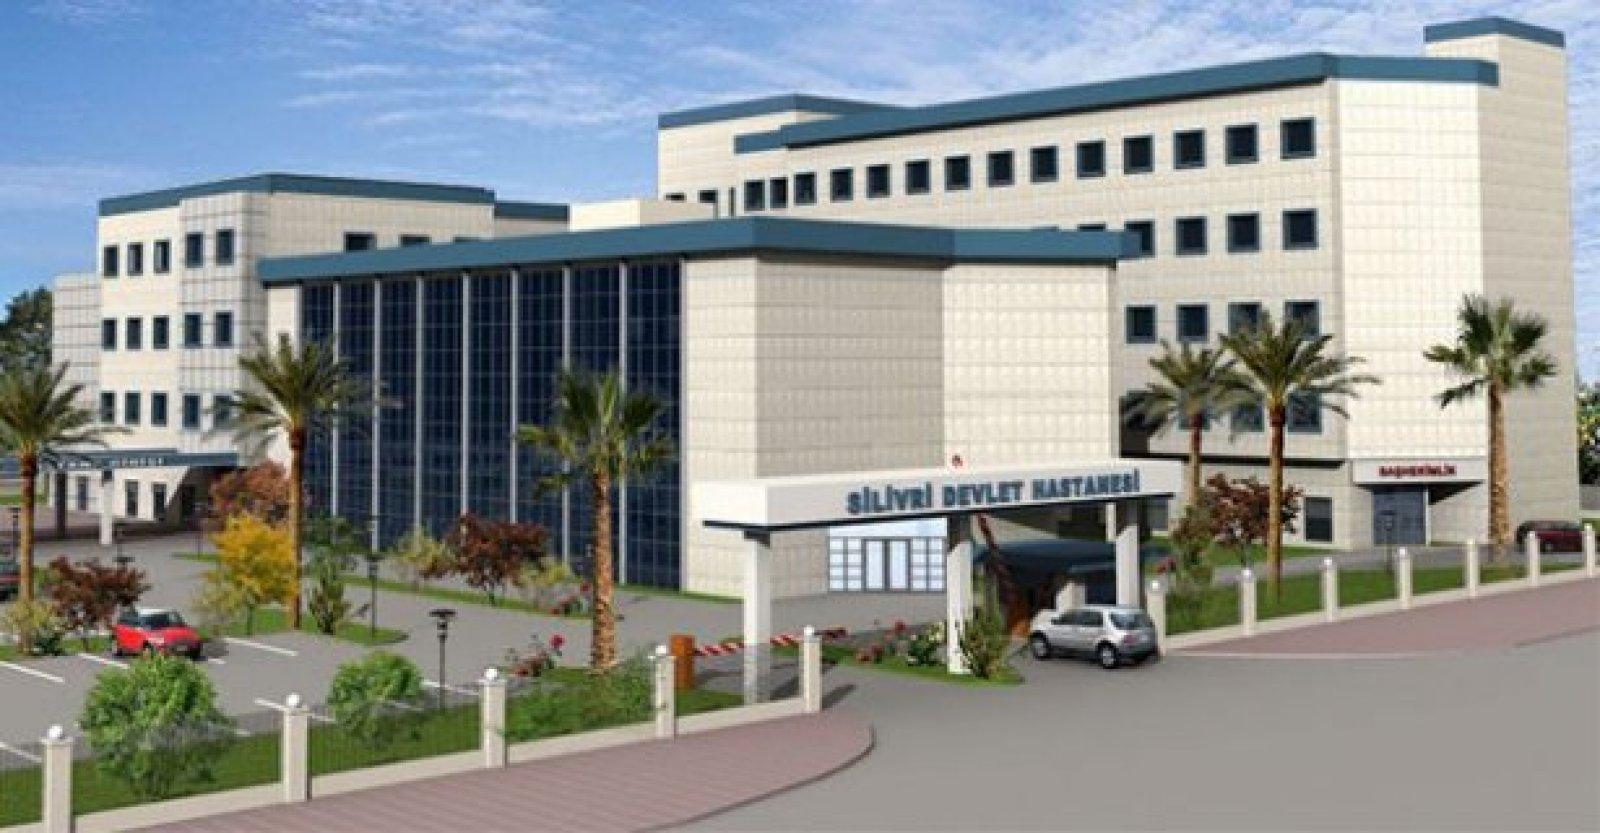 Silivri Devlet Hastanesi